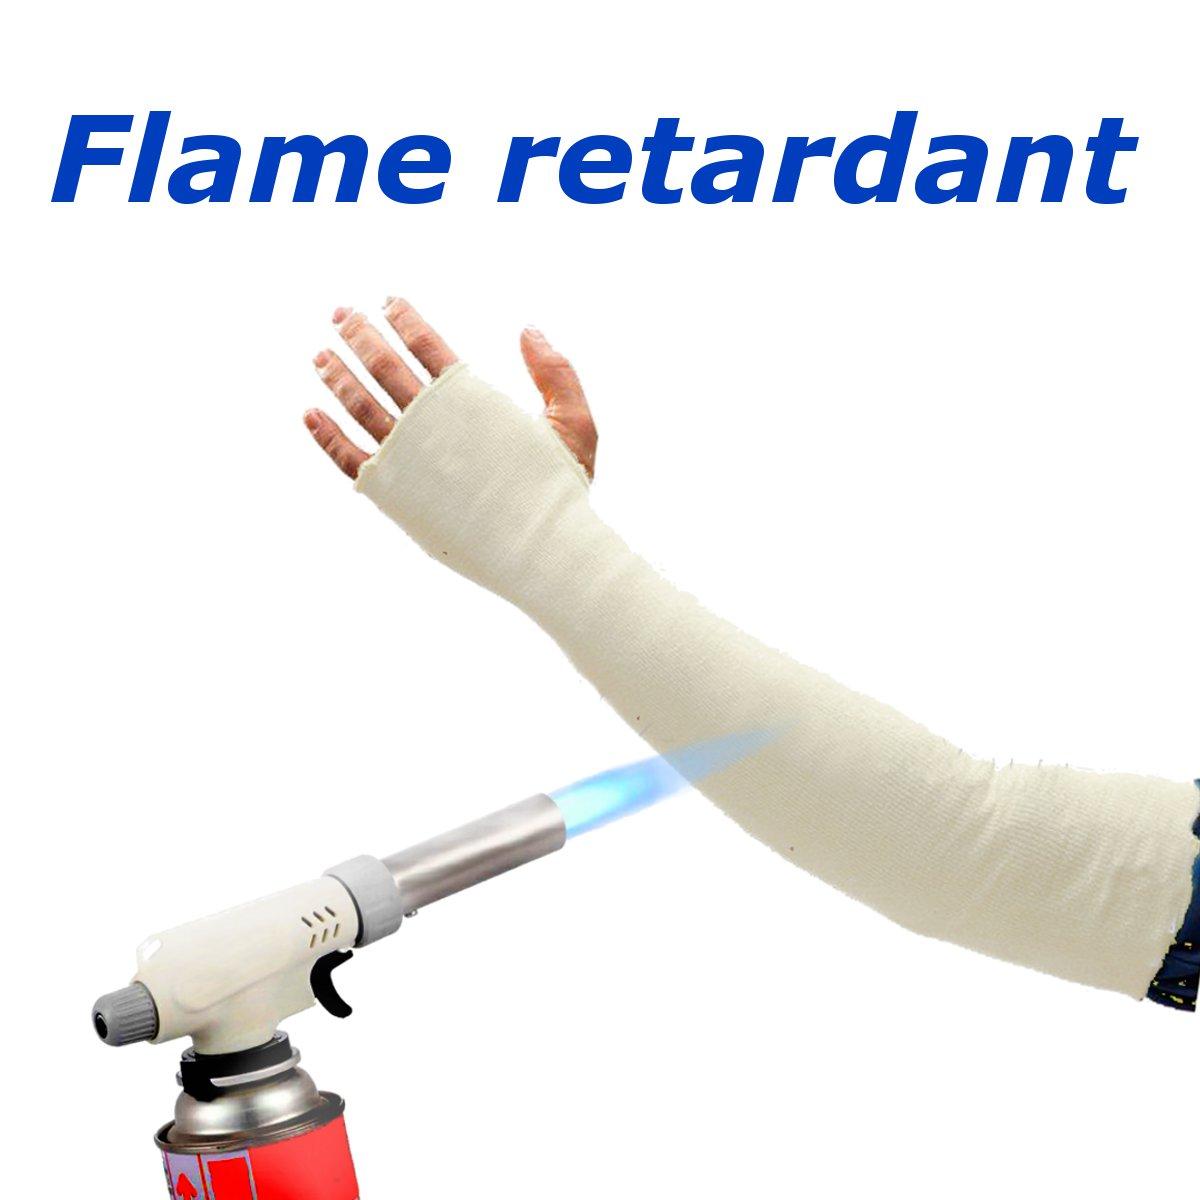 1 Pair Welding Protection Sleeves Cutting Resistant Flame Resistant Heat Protective Welding Lengthen Arm Sleeves Denim Working